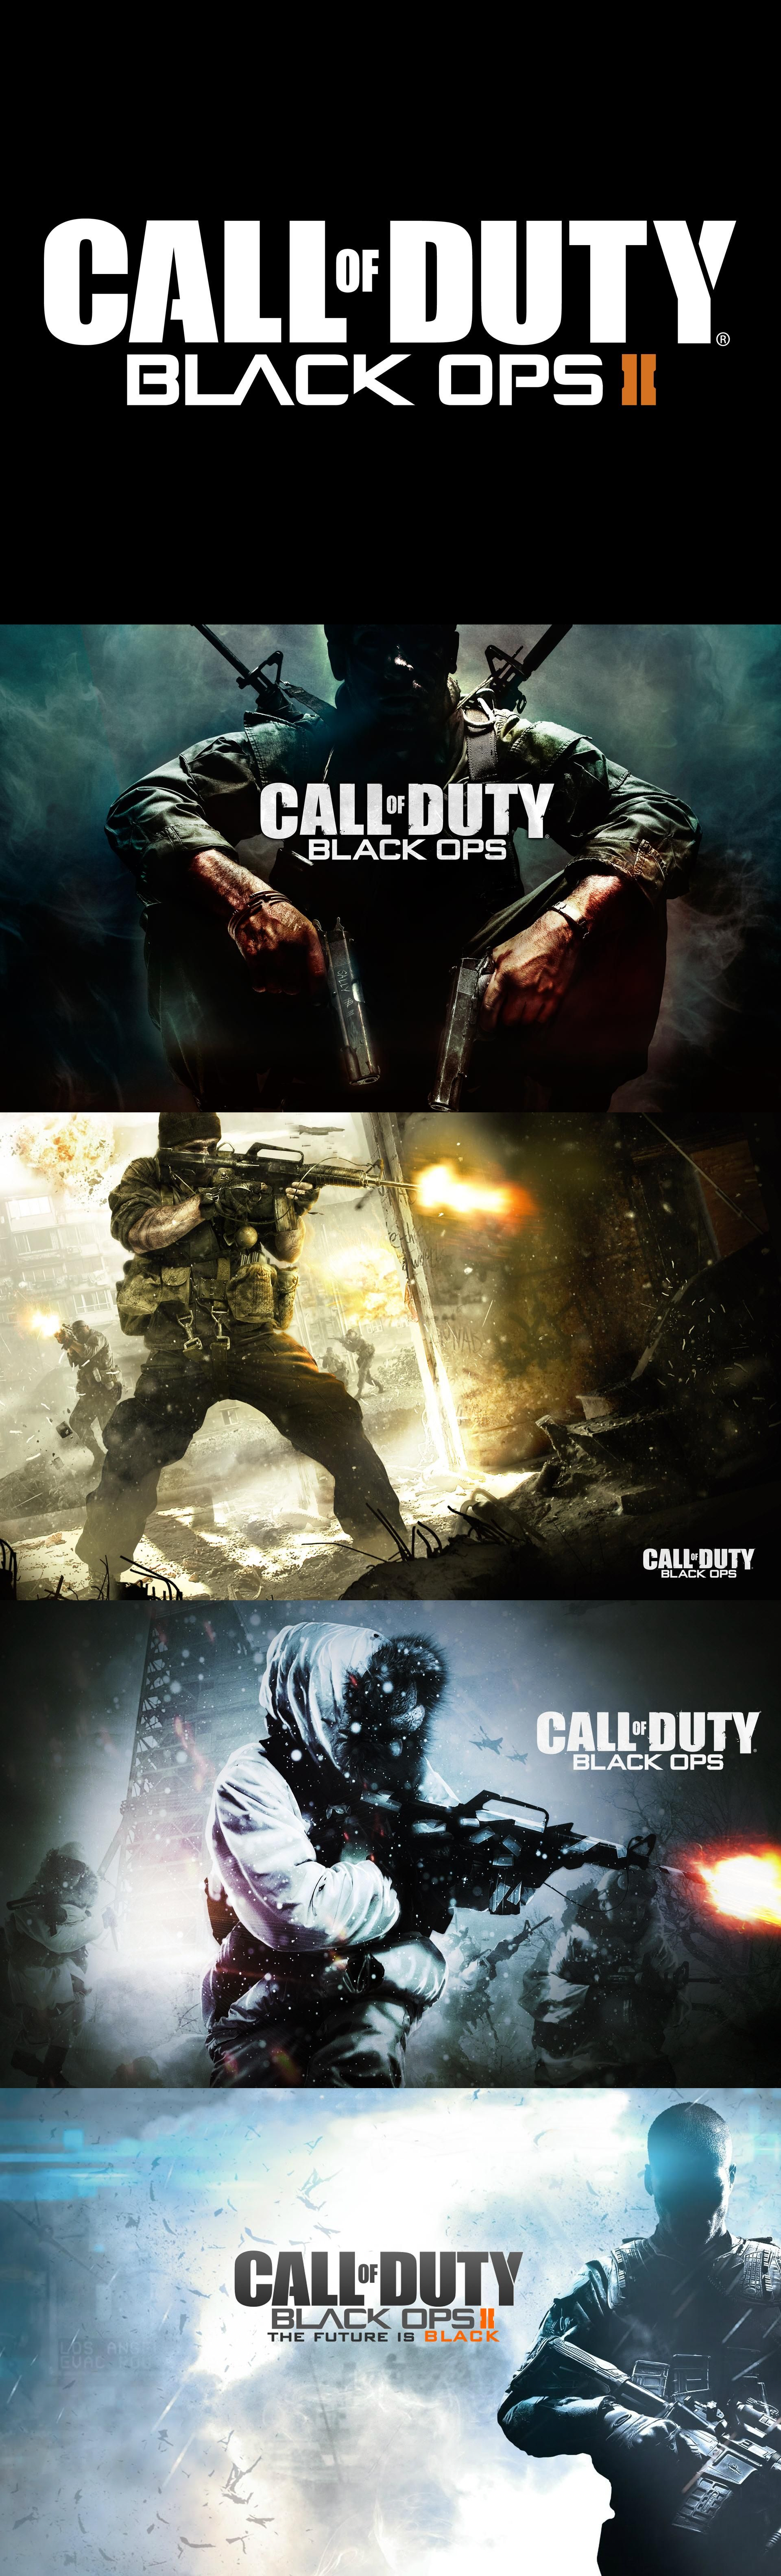 91 Call Of Duty Ideas Call Of Duty Modern Warfare Call Of Duty Ghosts